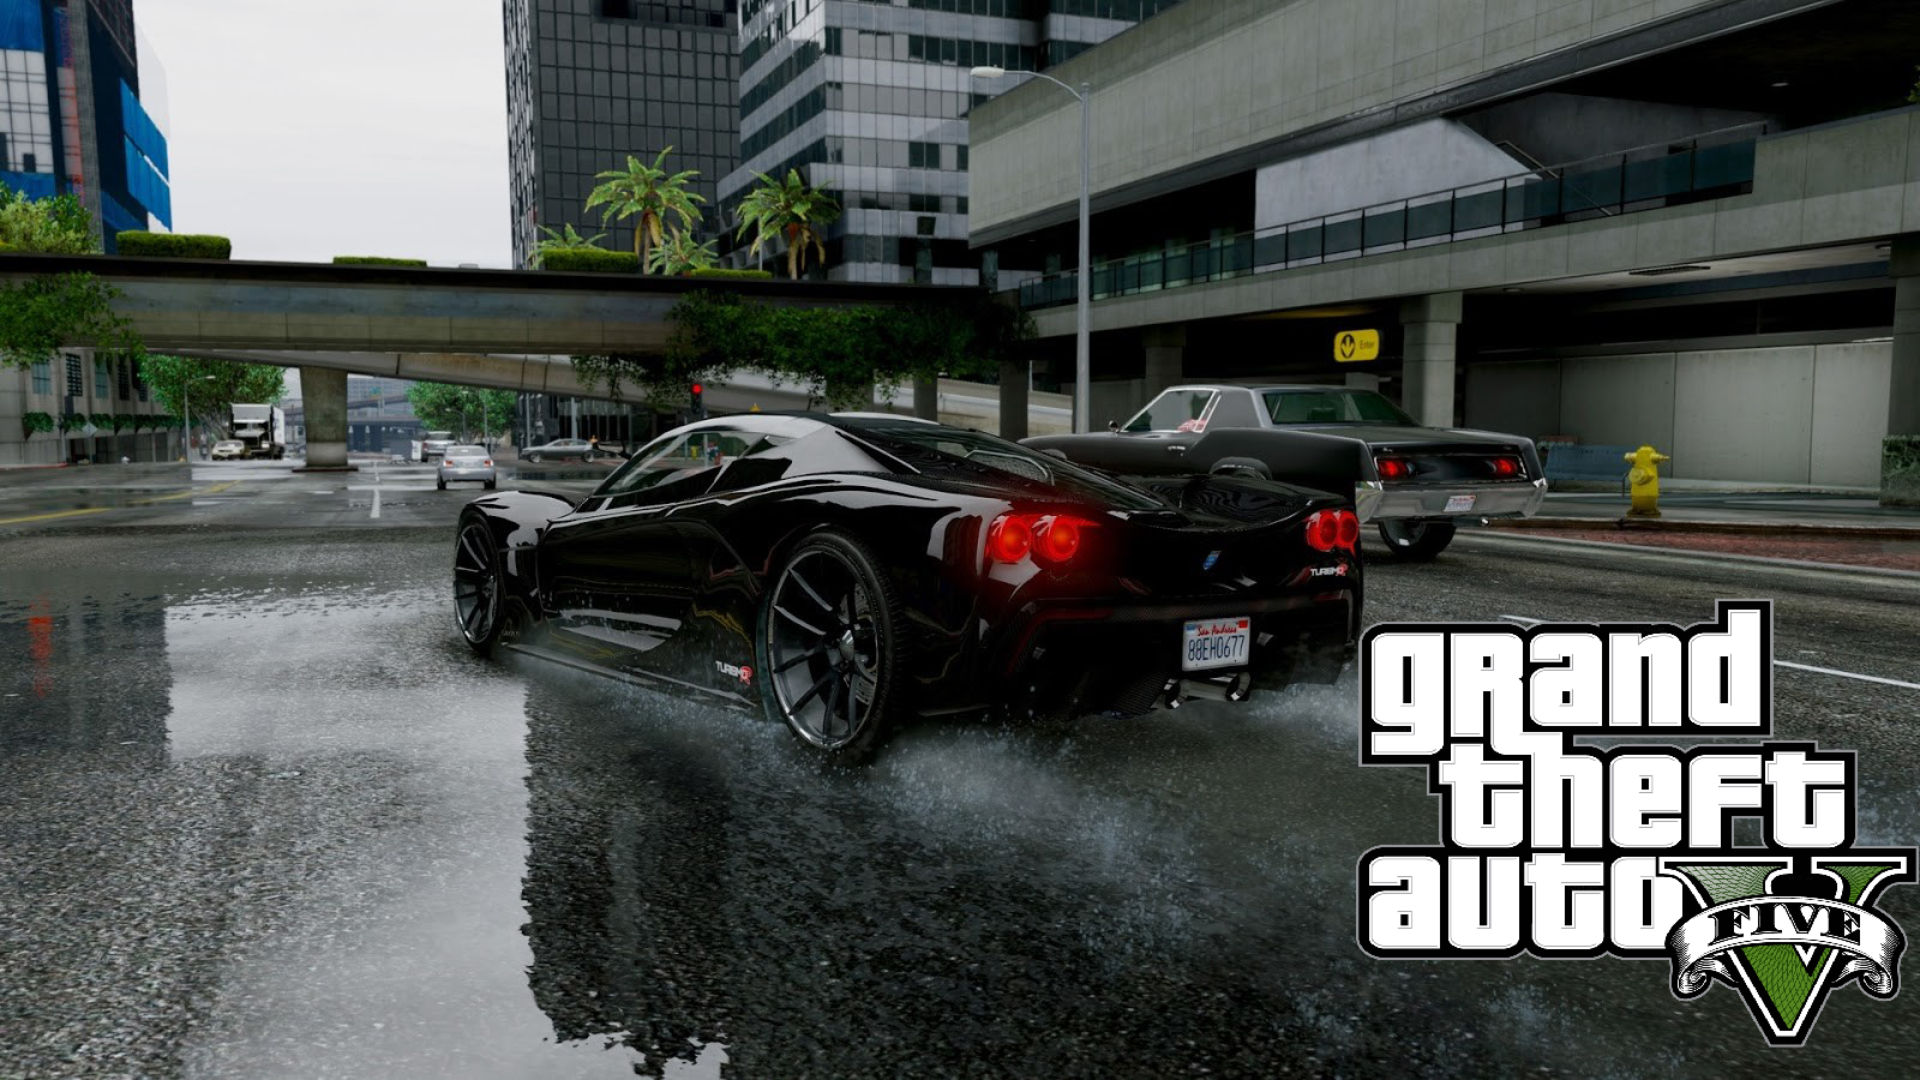 Turismo R, GTA5, rain, video games, car, vehicle, black cars ...